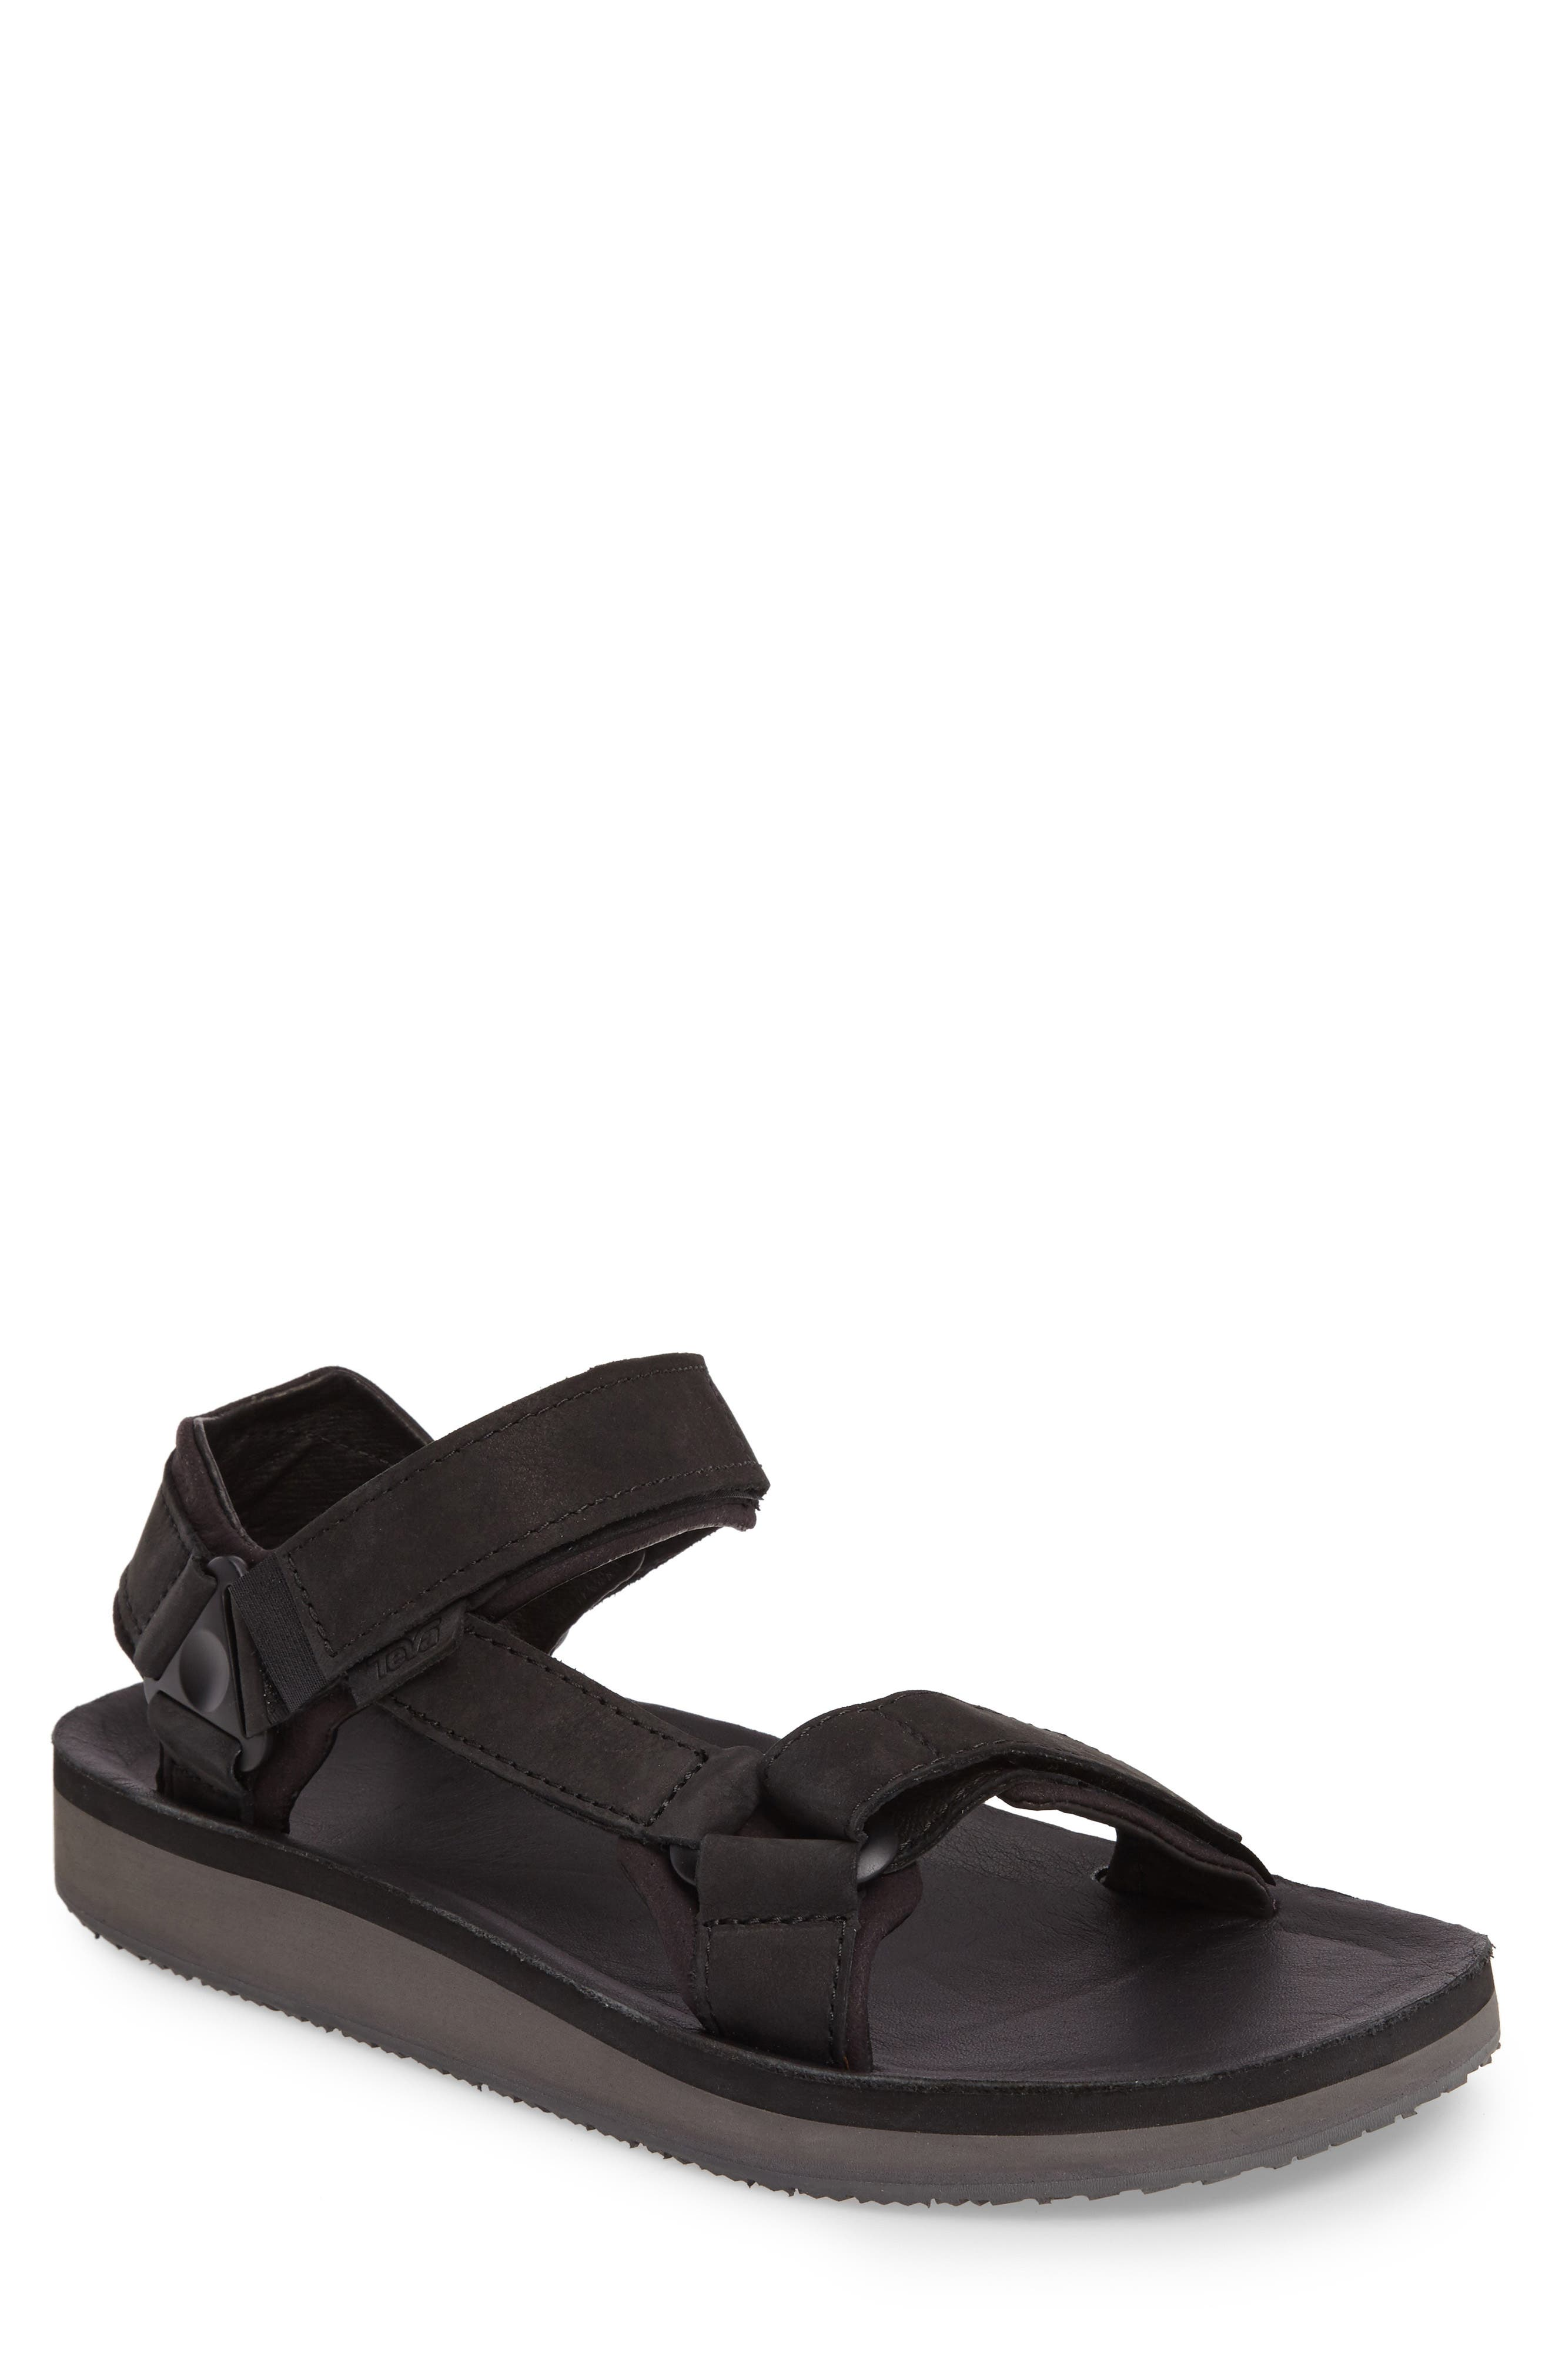 Original Universal Premier Sandal,                         Main,                         color, Black